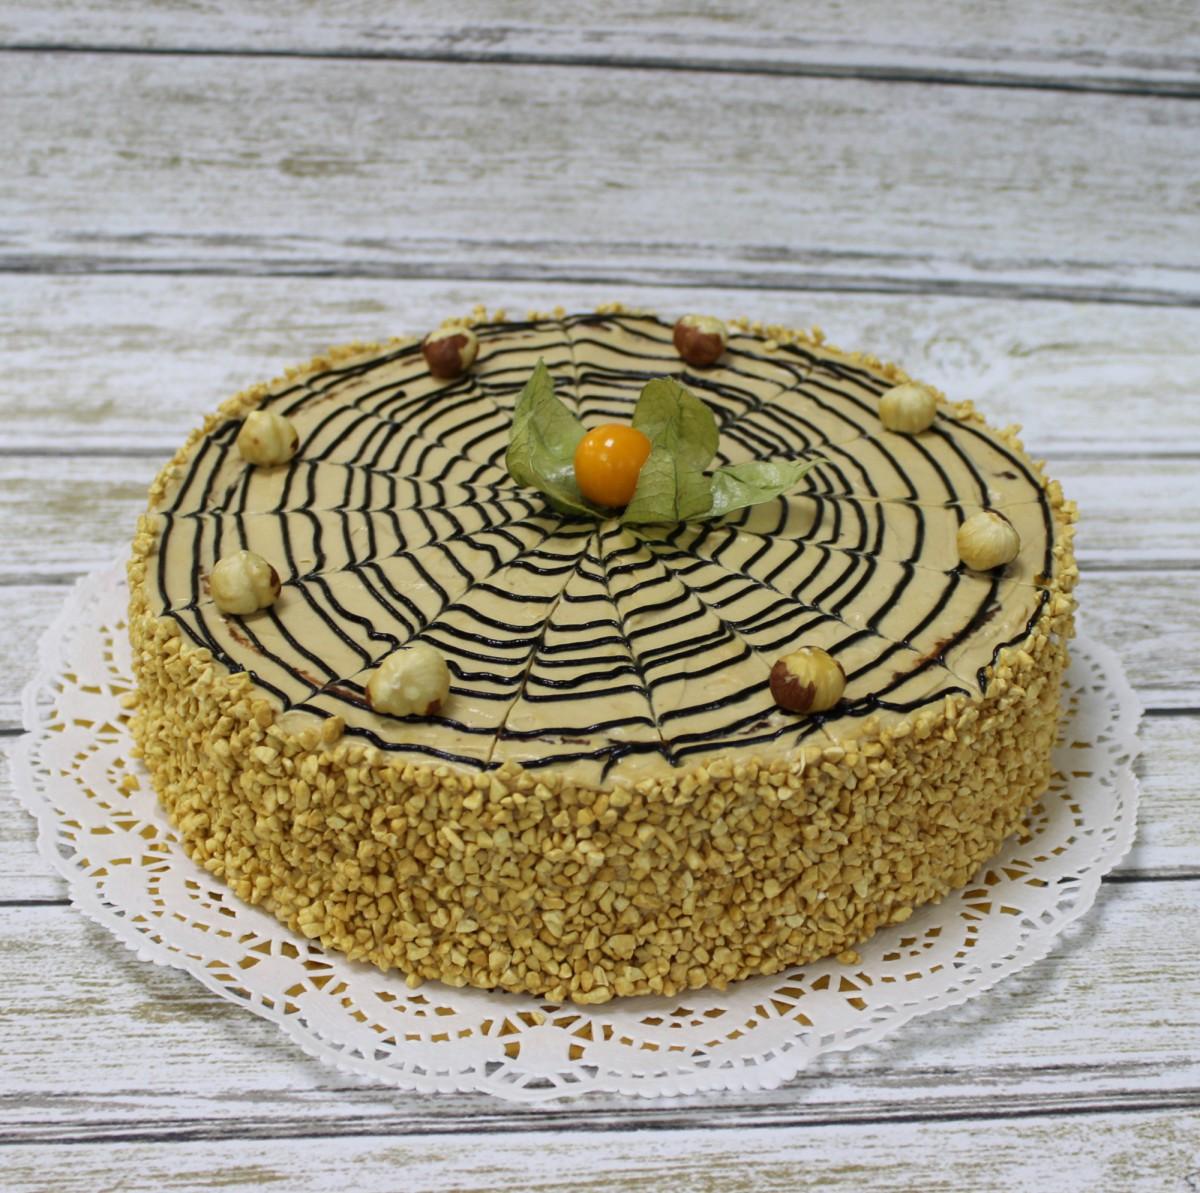 торт эстерхази кондитерская